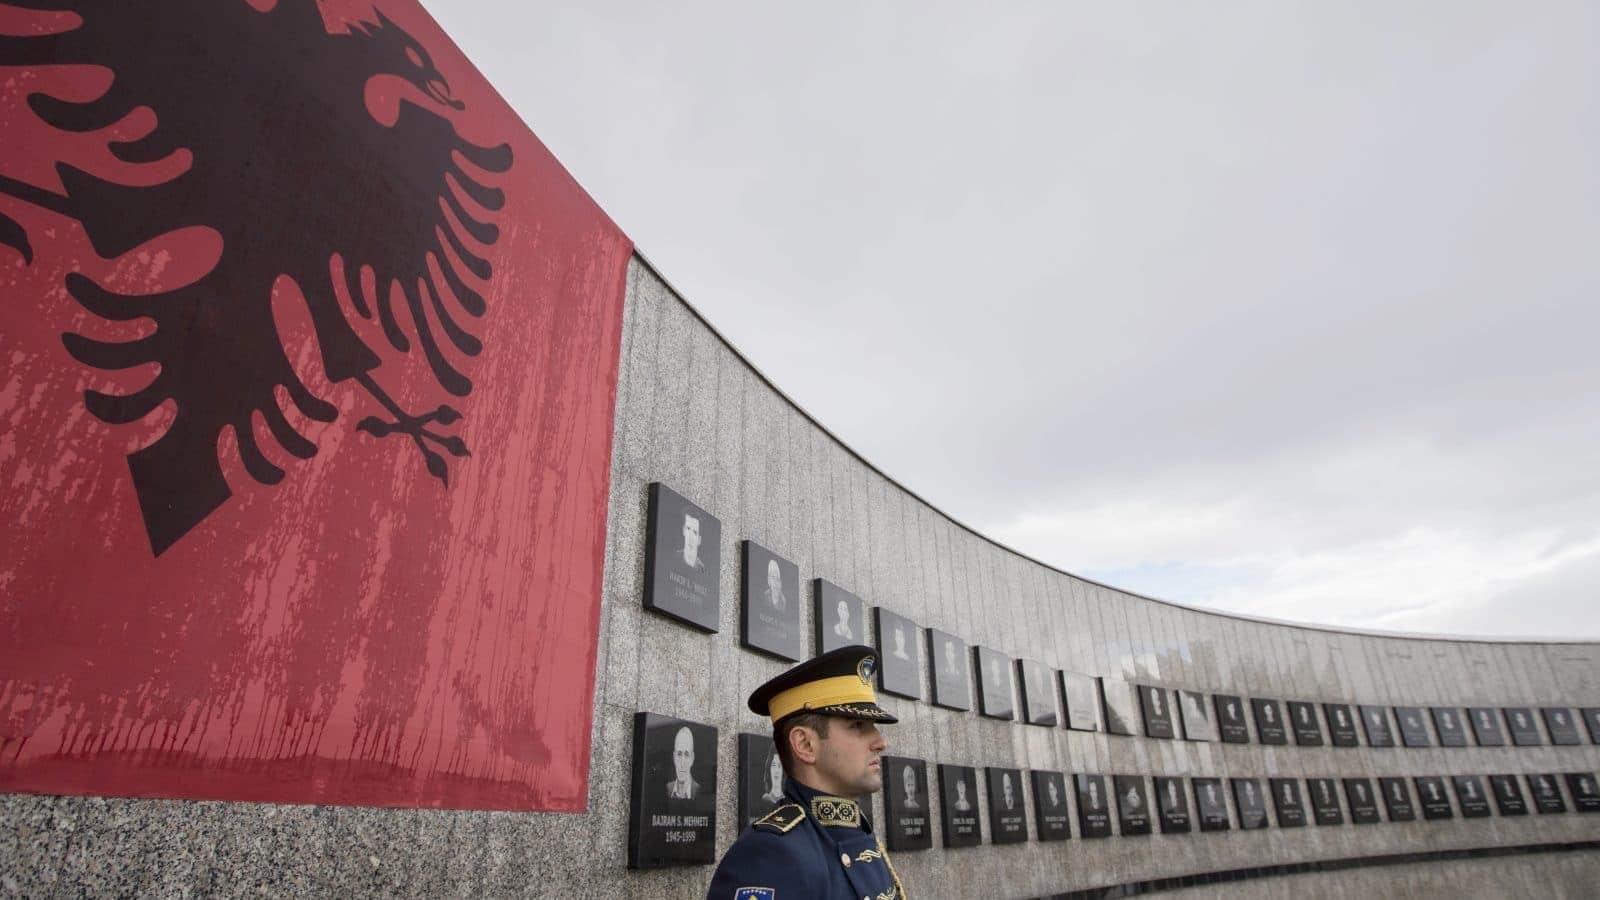 Kosovo Commemorates Massacre that Prompted NATO Bombing